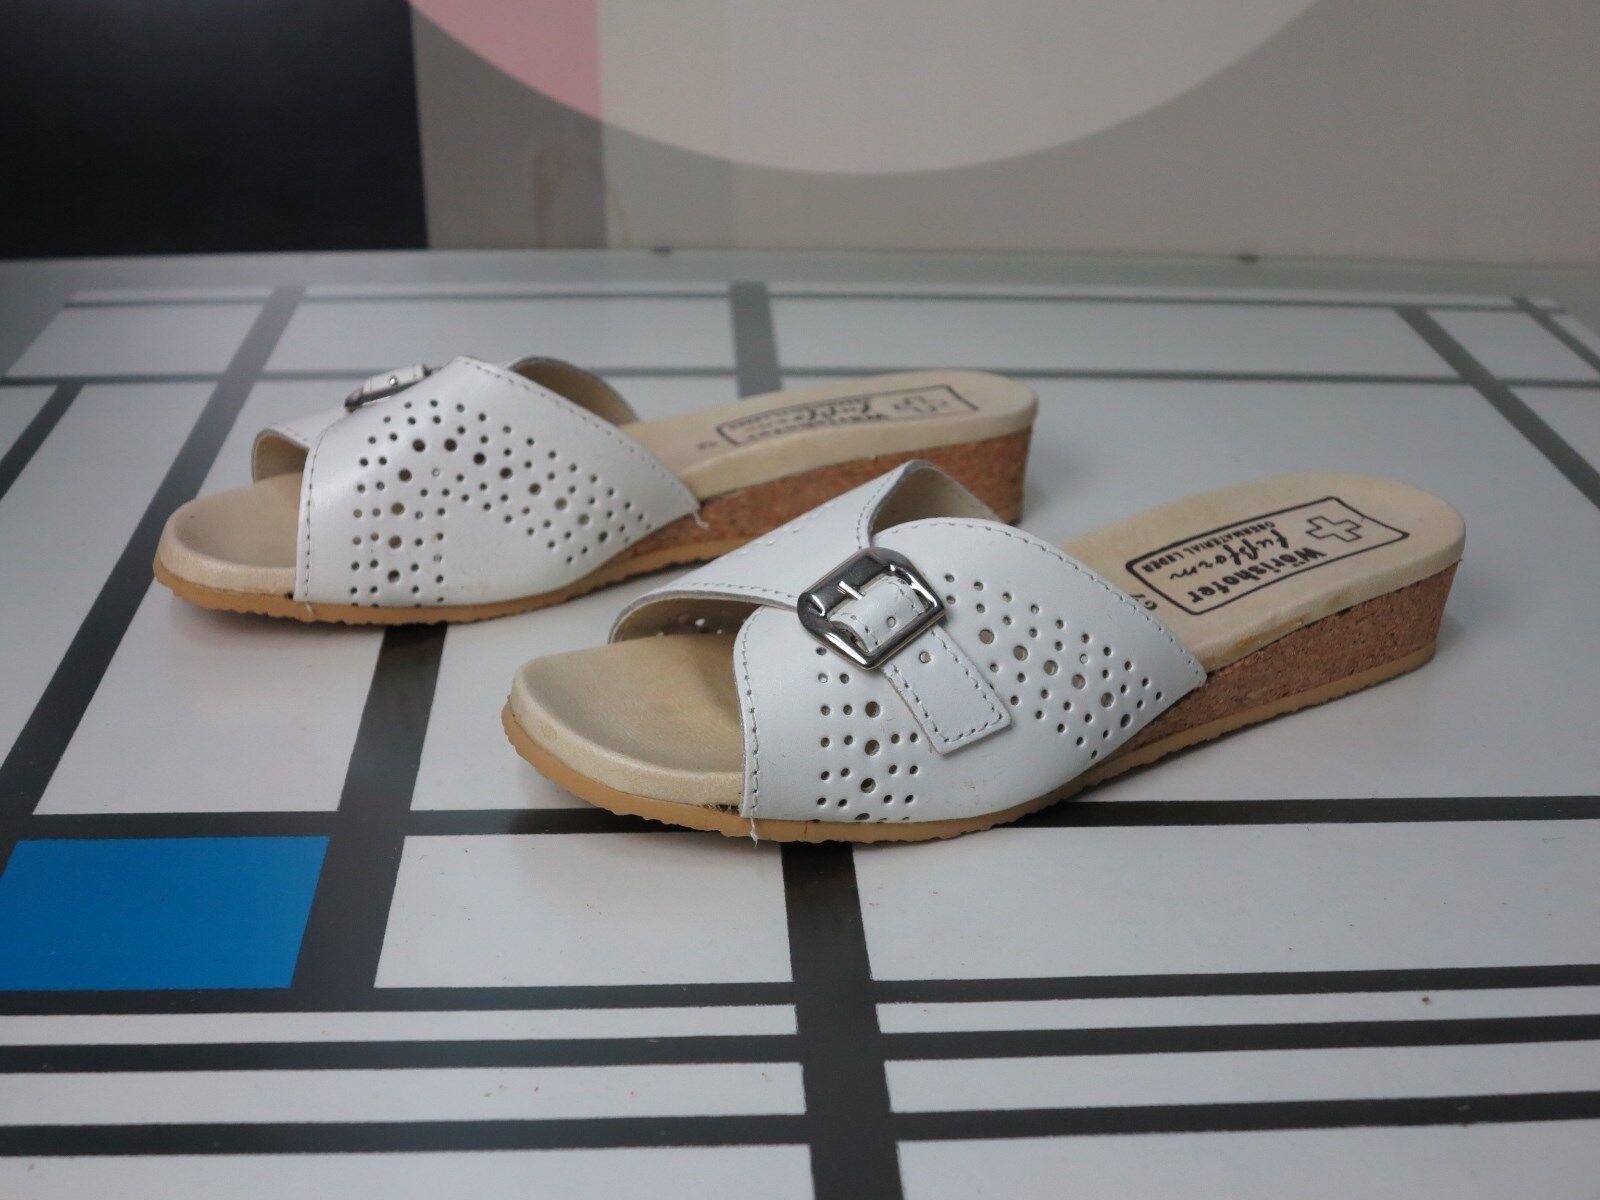 Wörishofer foot shape makes Sandal Bath shoes 42 OVP True Vintage Wood Sandals Bath shoes